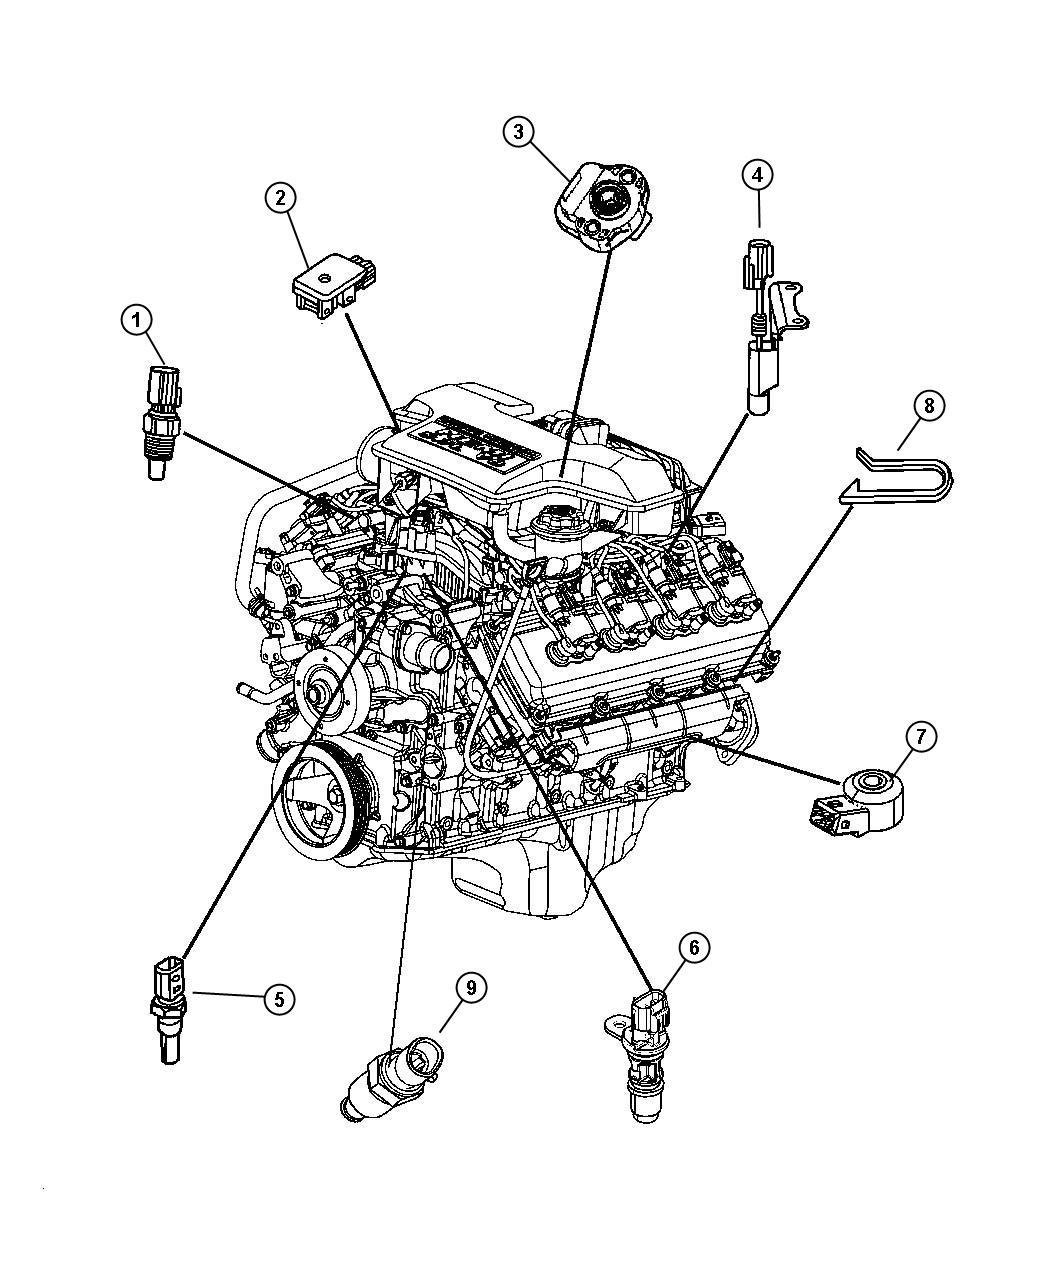 Bmw Differential Pressure Sensor Location Bmw Auto Fuse